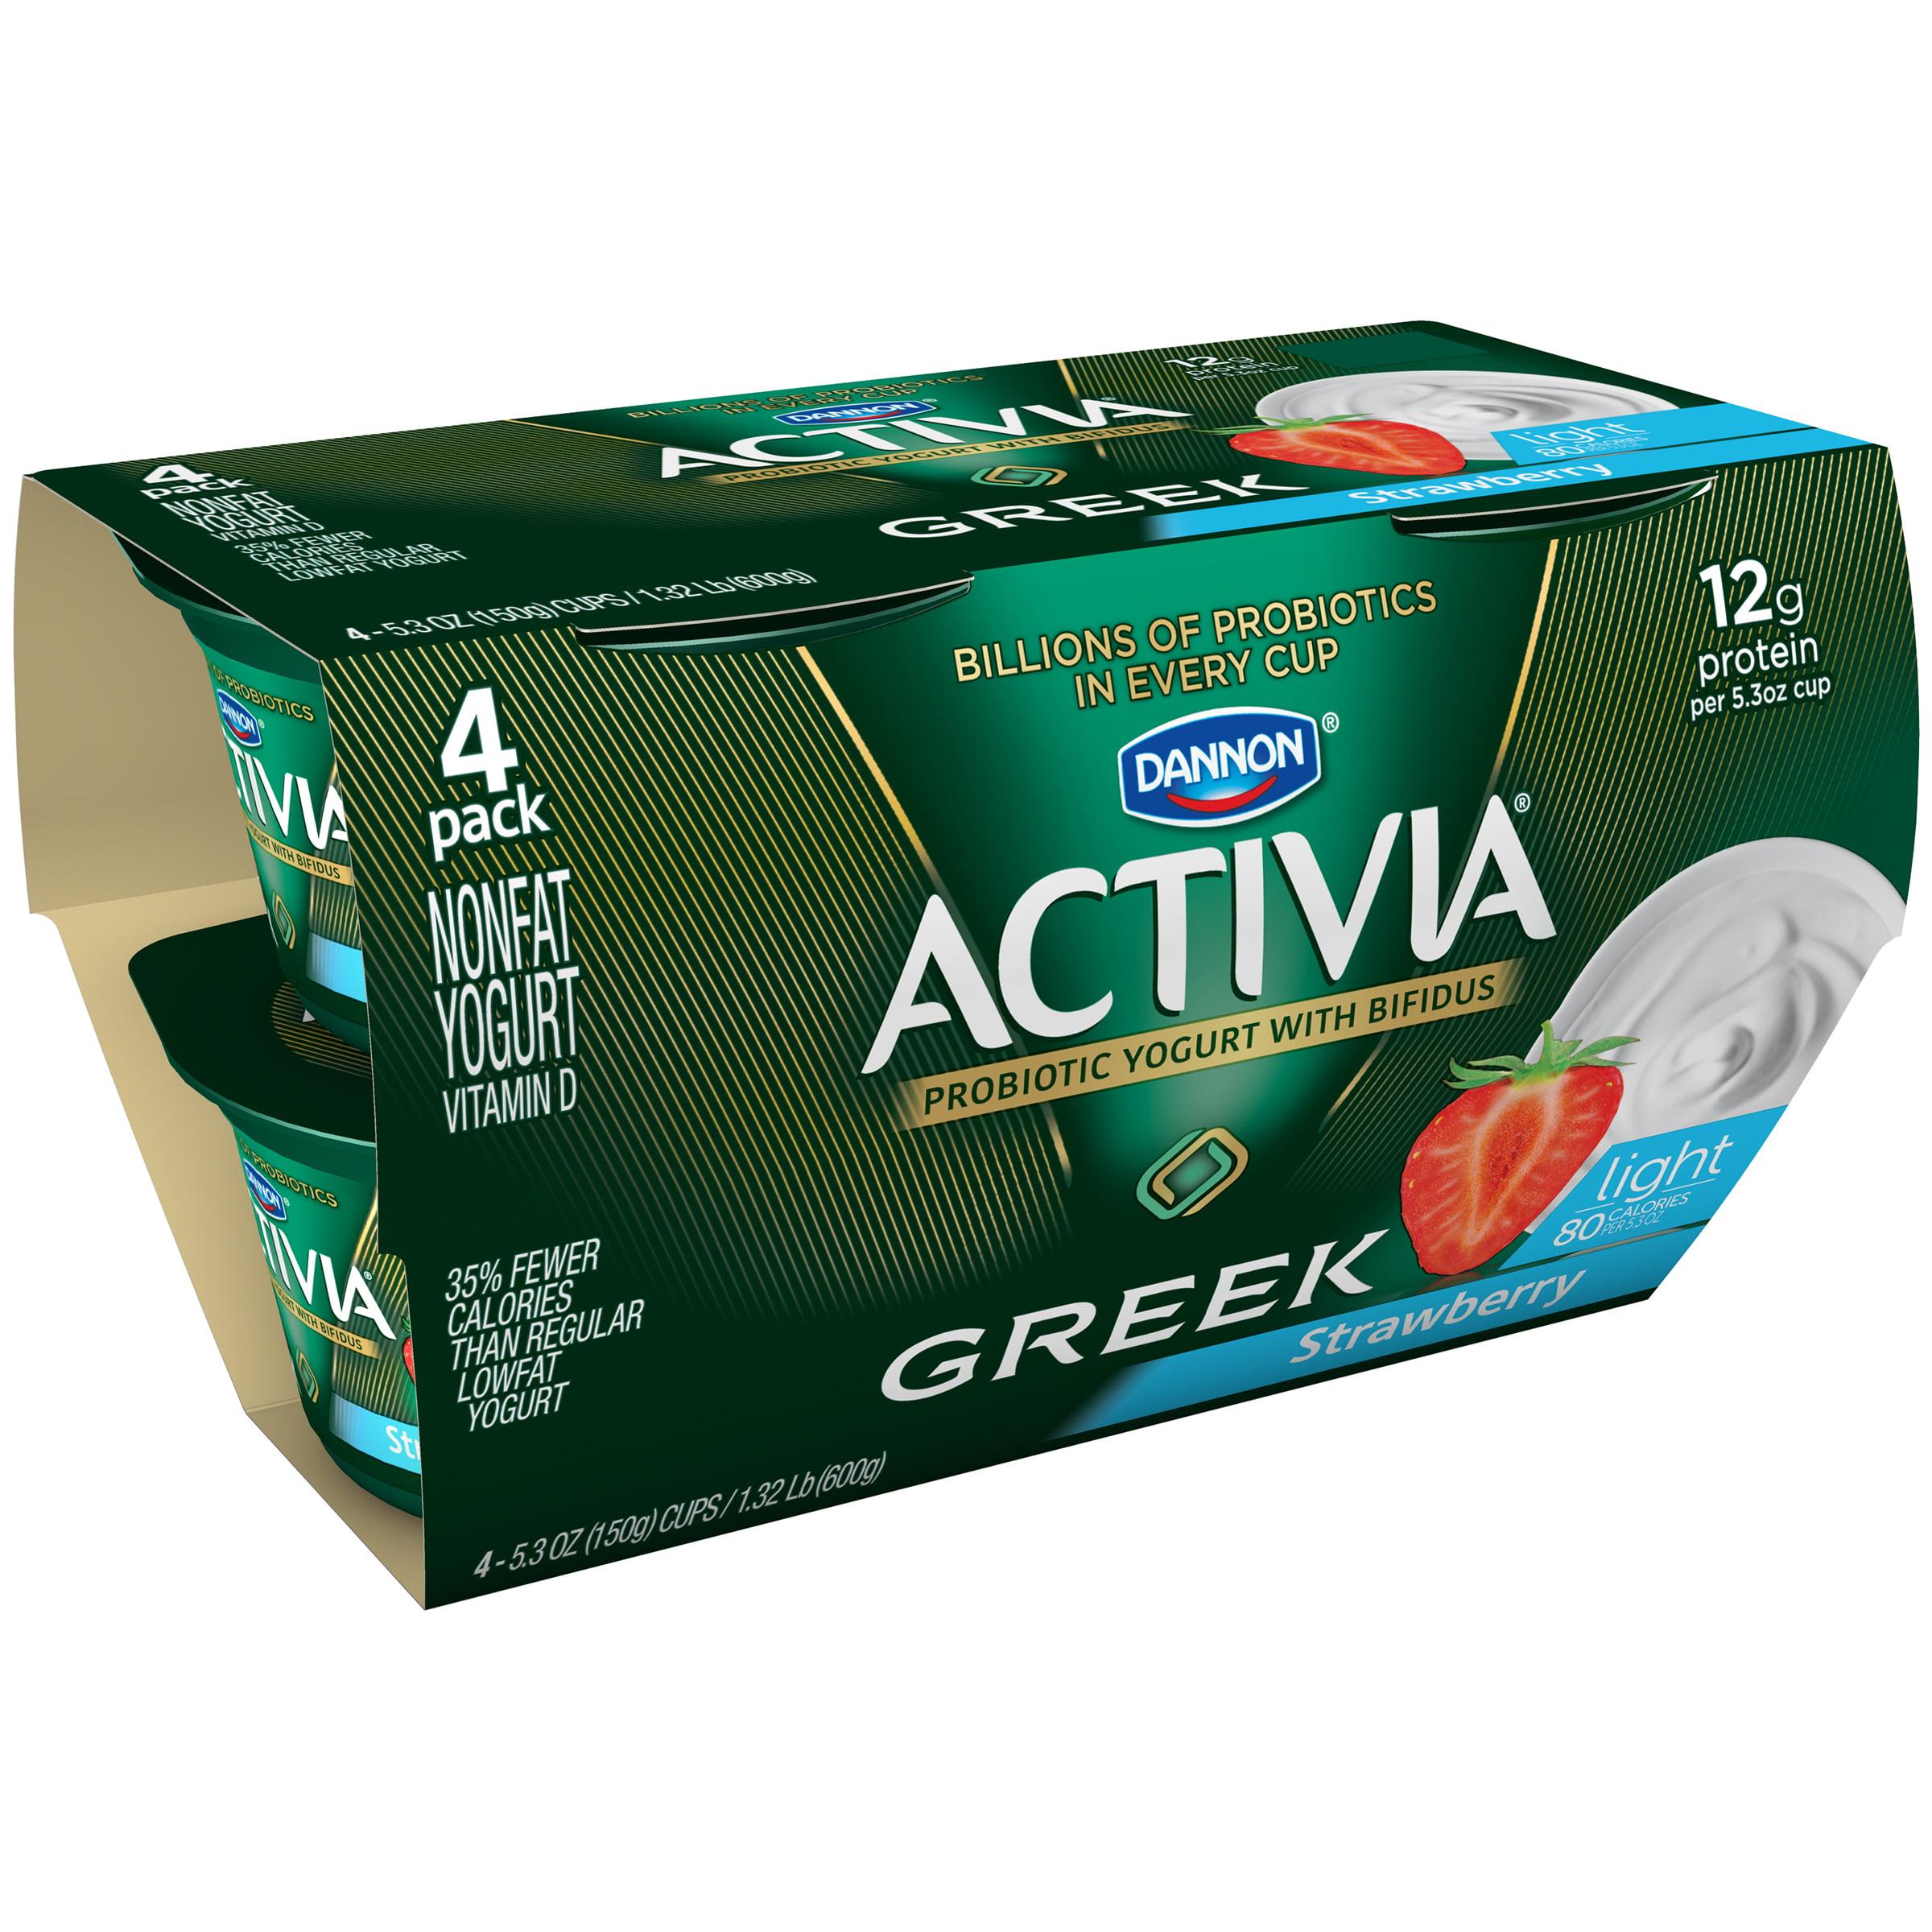 Image of Dannon ® Activia ® Light Greek Probiotic Blended Nonfat Yogurt Strawberry 4-5.3 oz. Pack